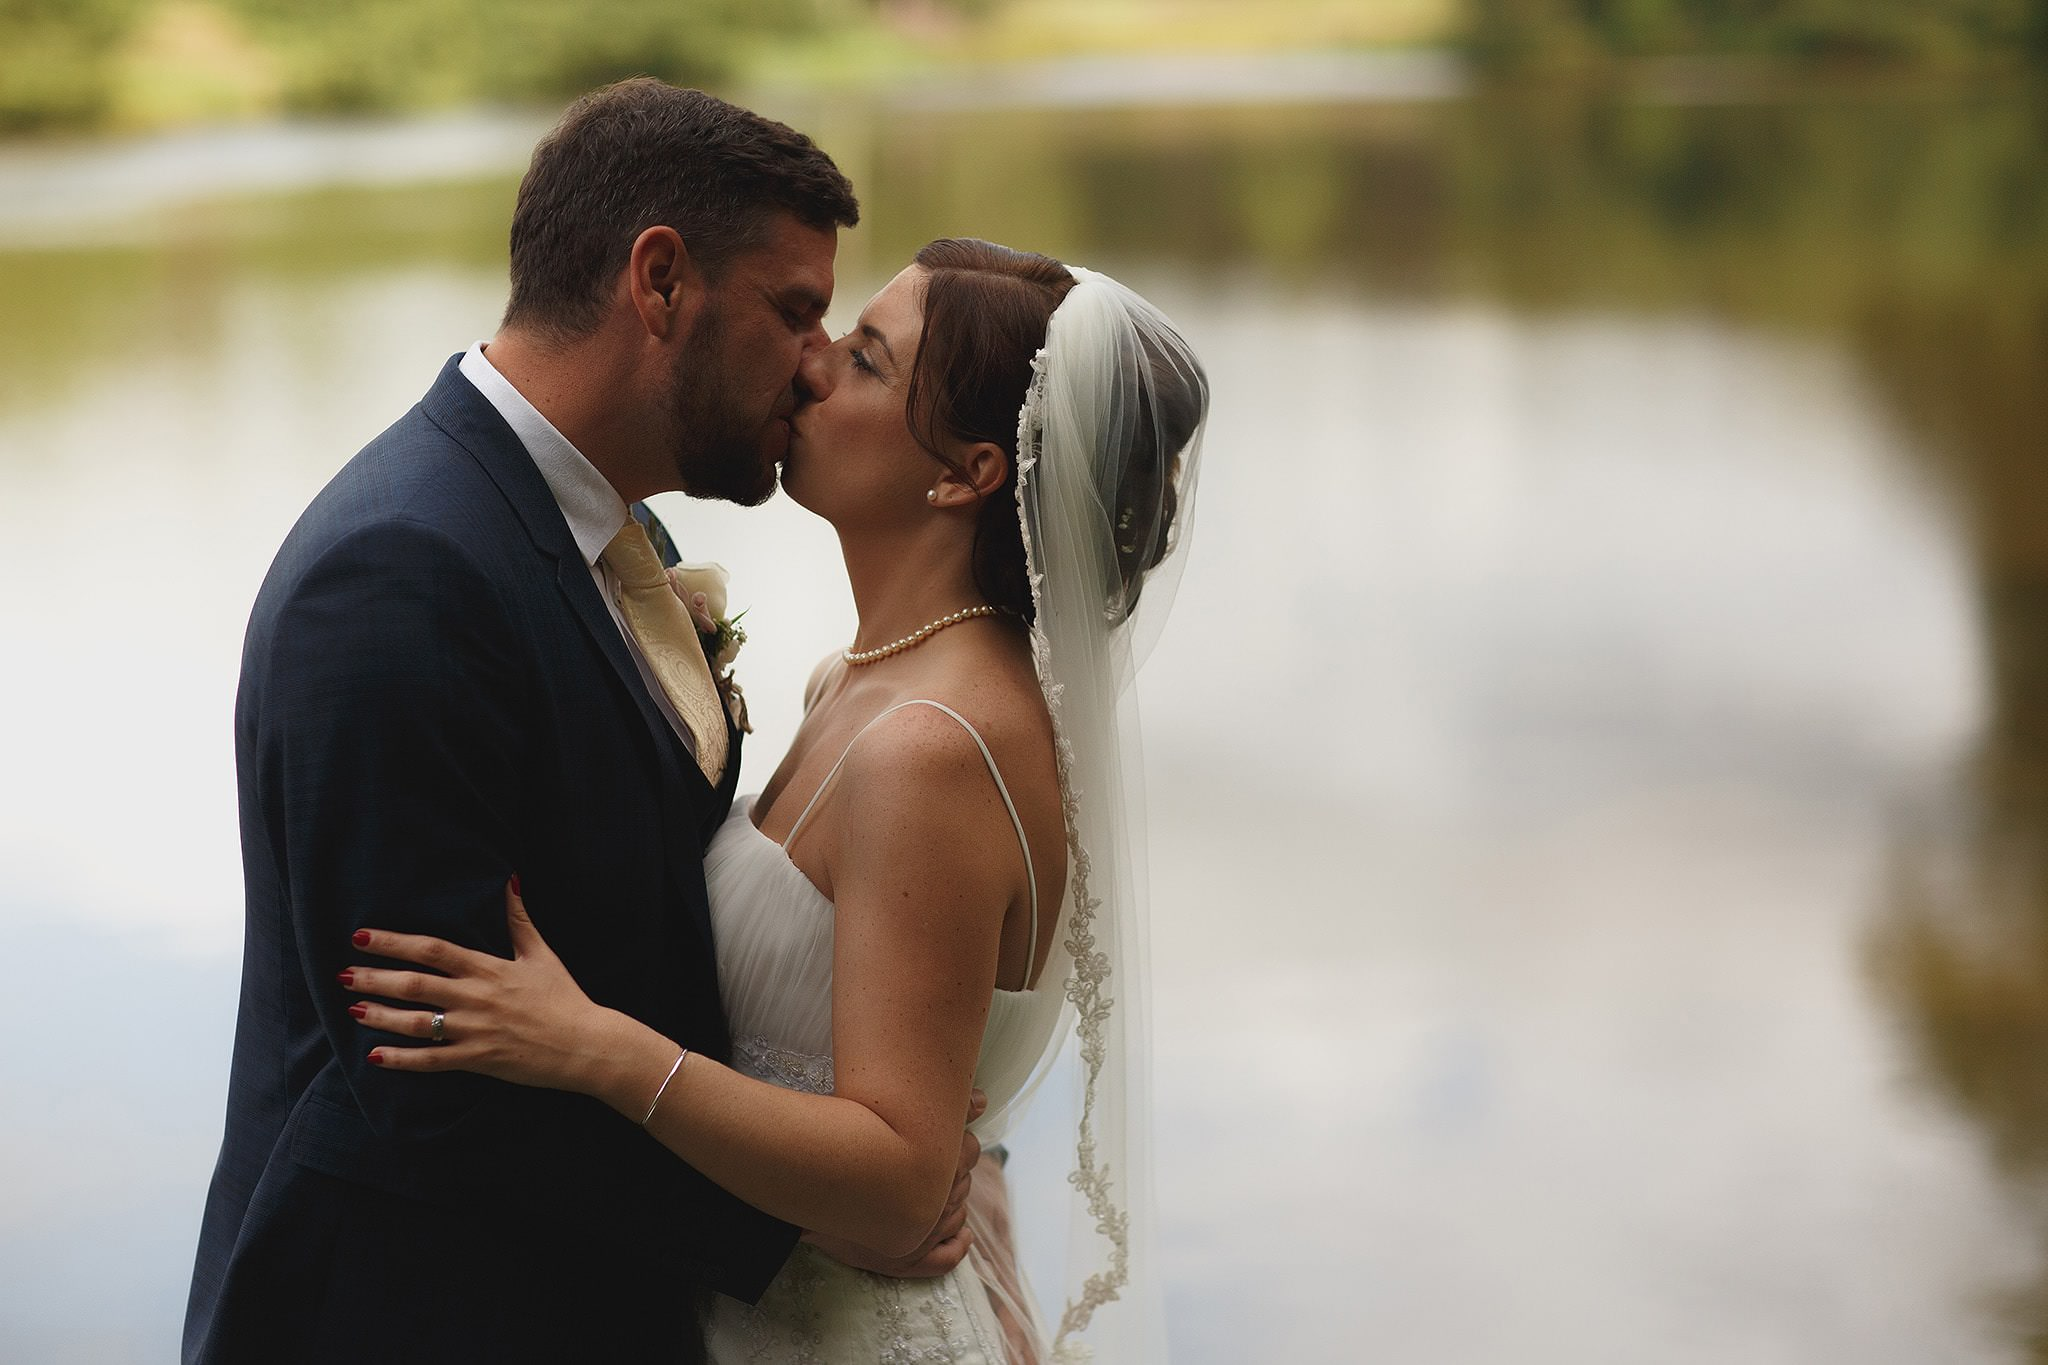 Bride and groom kissing at Browsholme Hall Wedding.